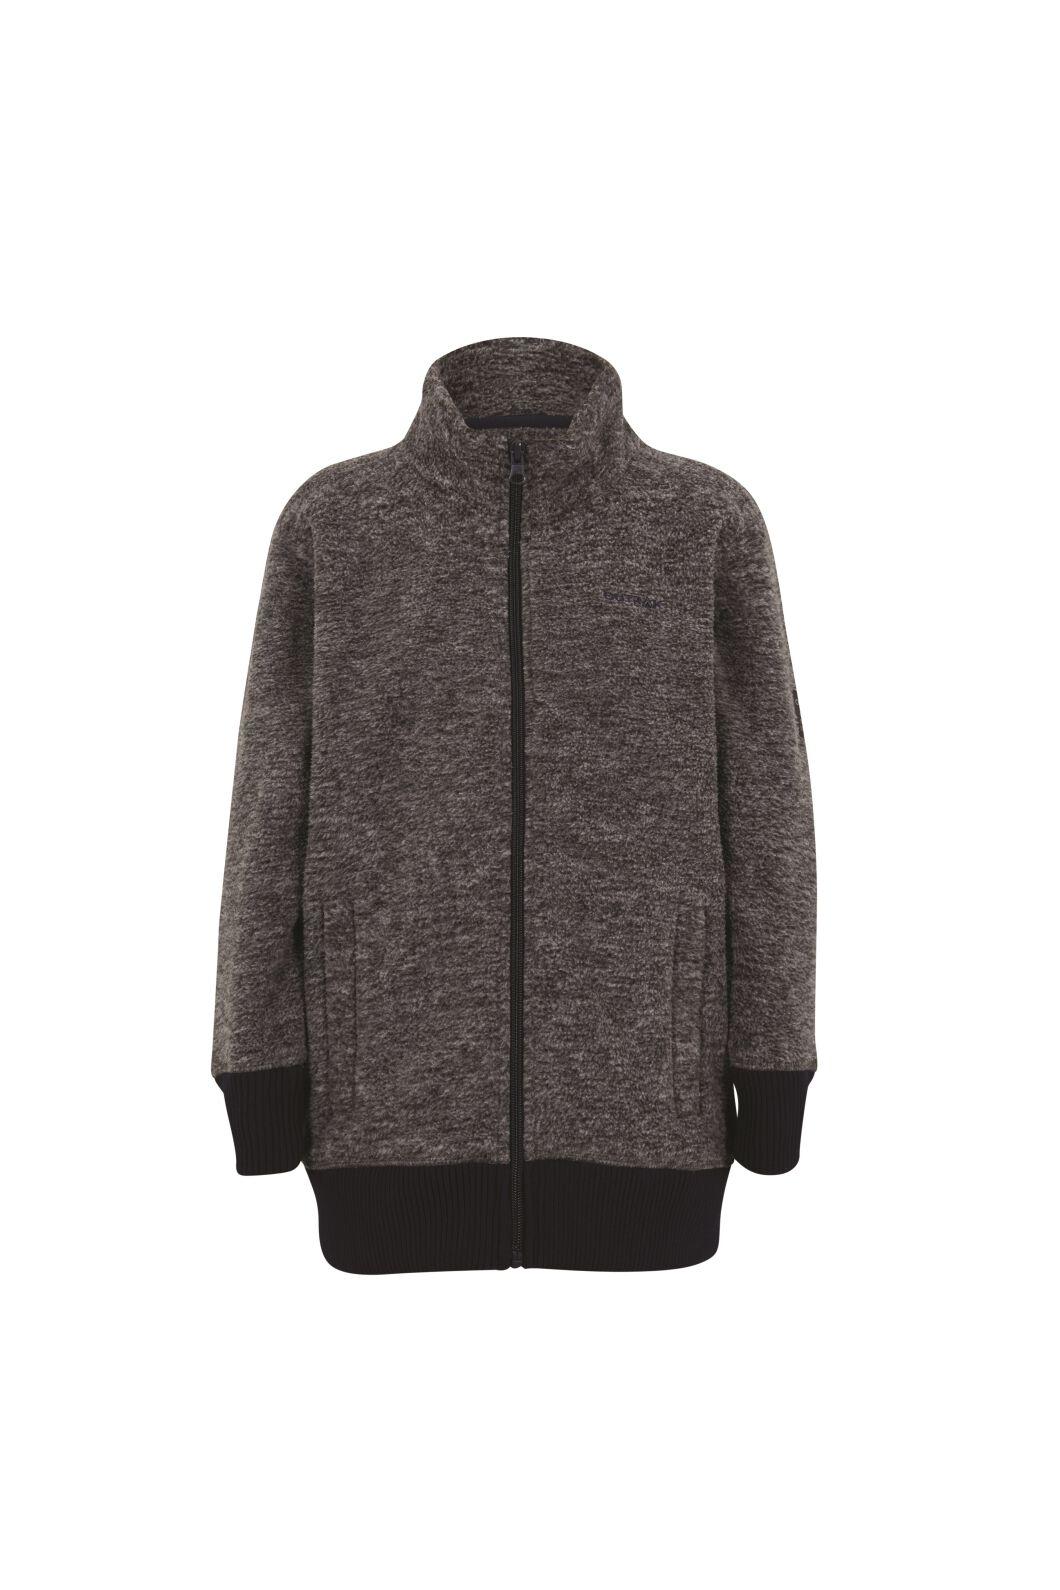 Outrak Kids' Yak Fleece Jacket, Grey Marle, hi-res